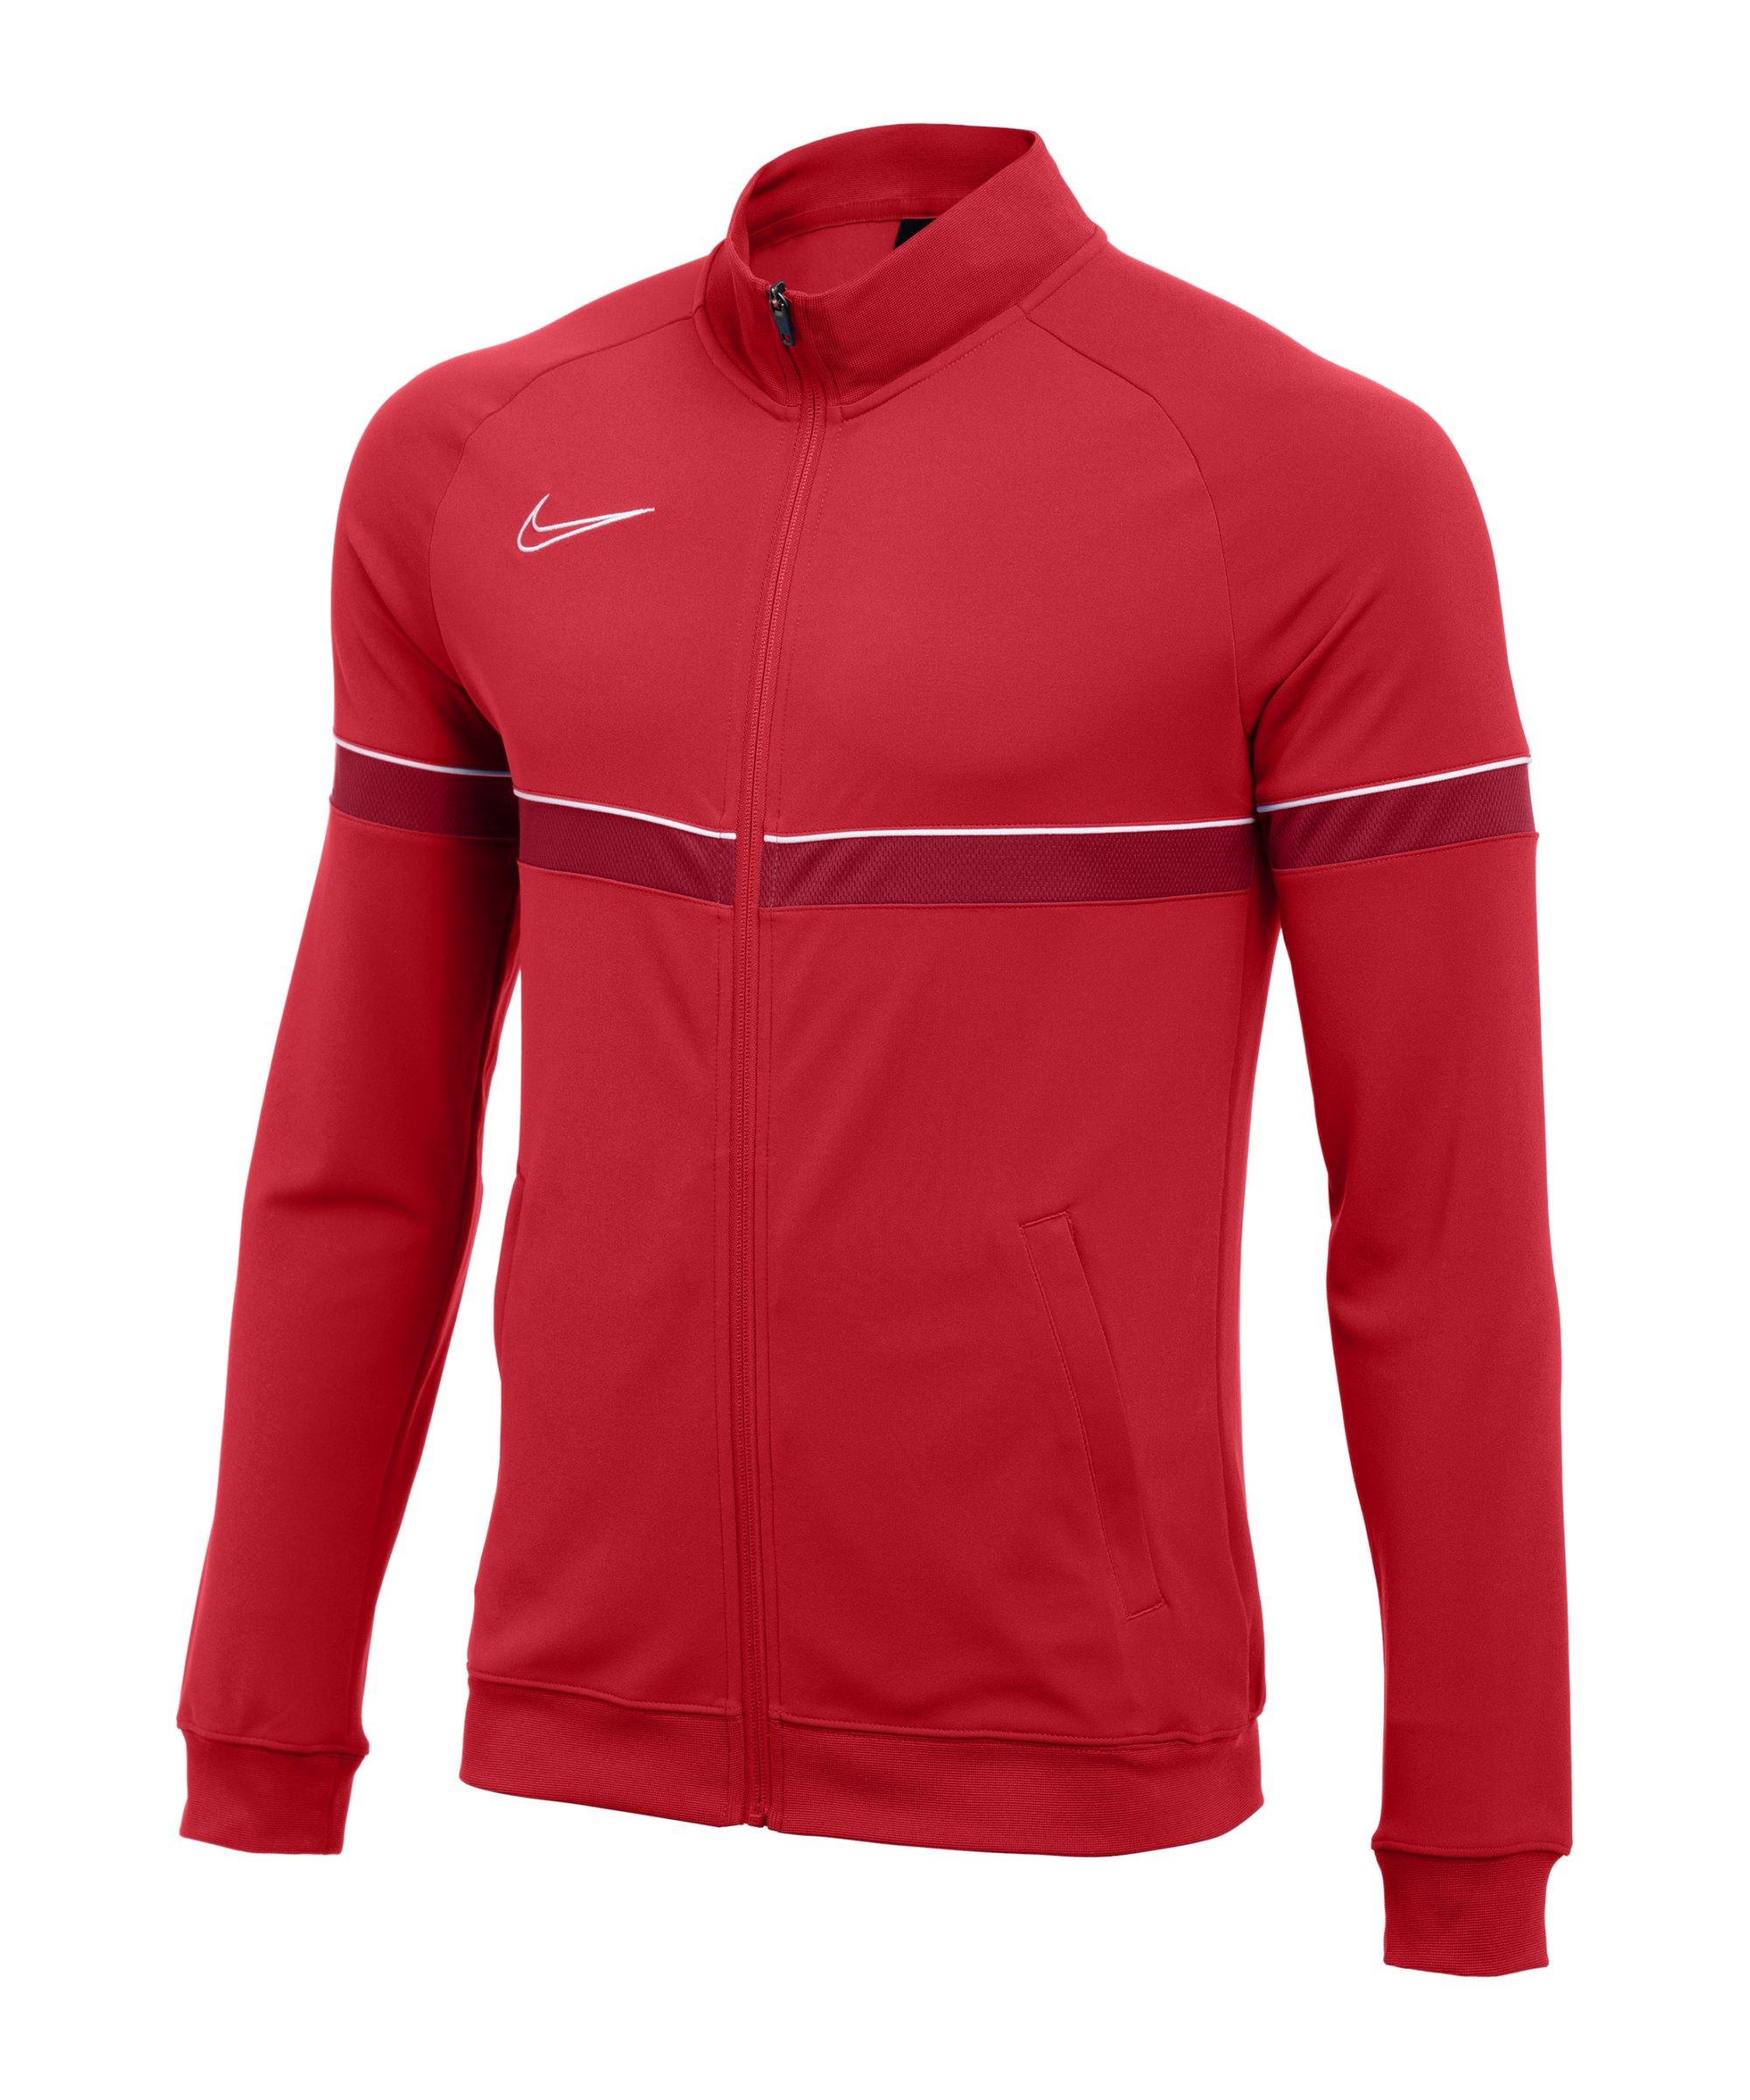 Nike Academy 21 Knit Trainingsjacke Kids Rot F657 - rot